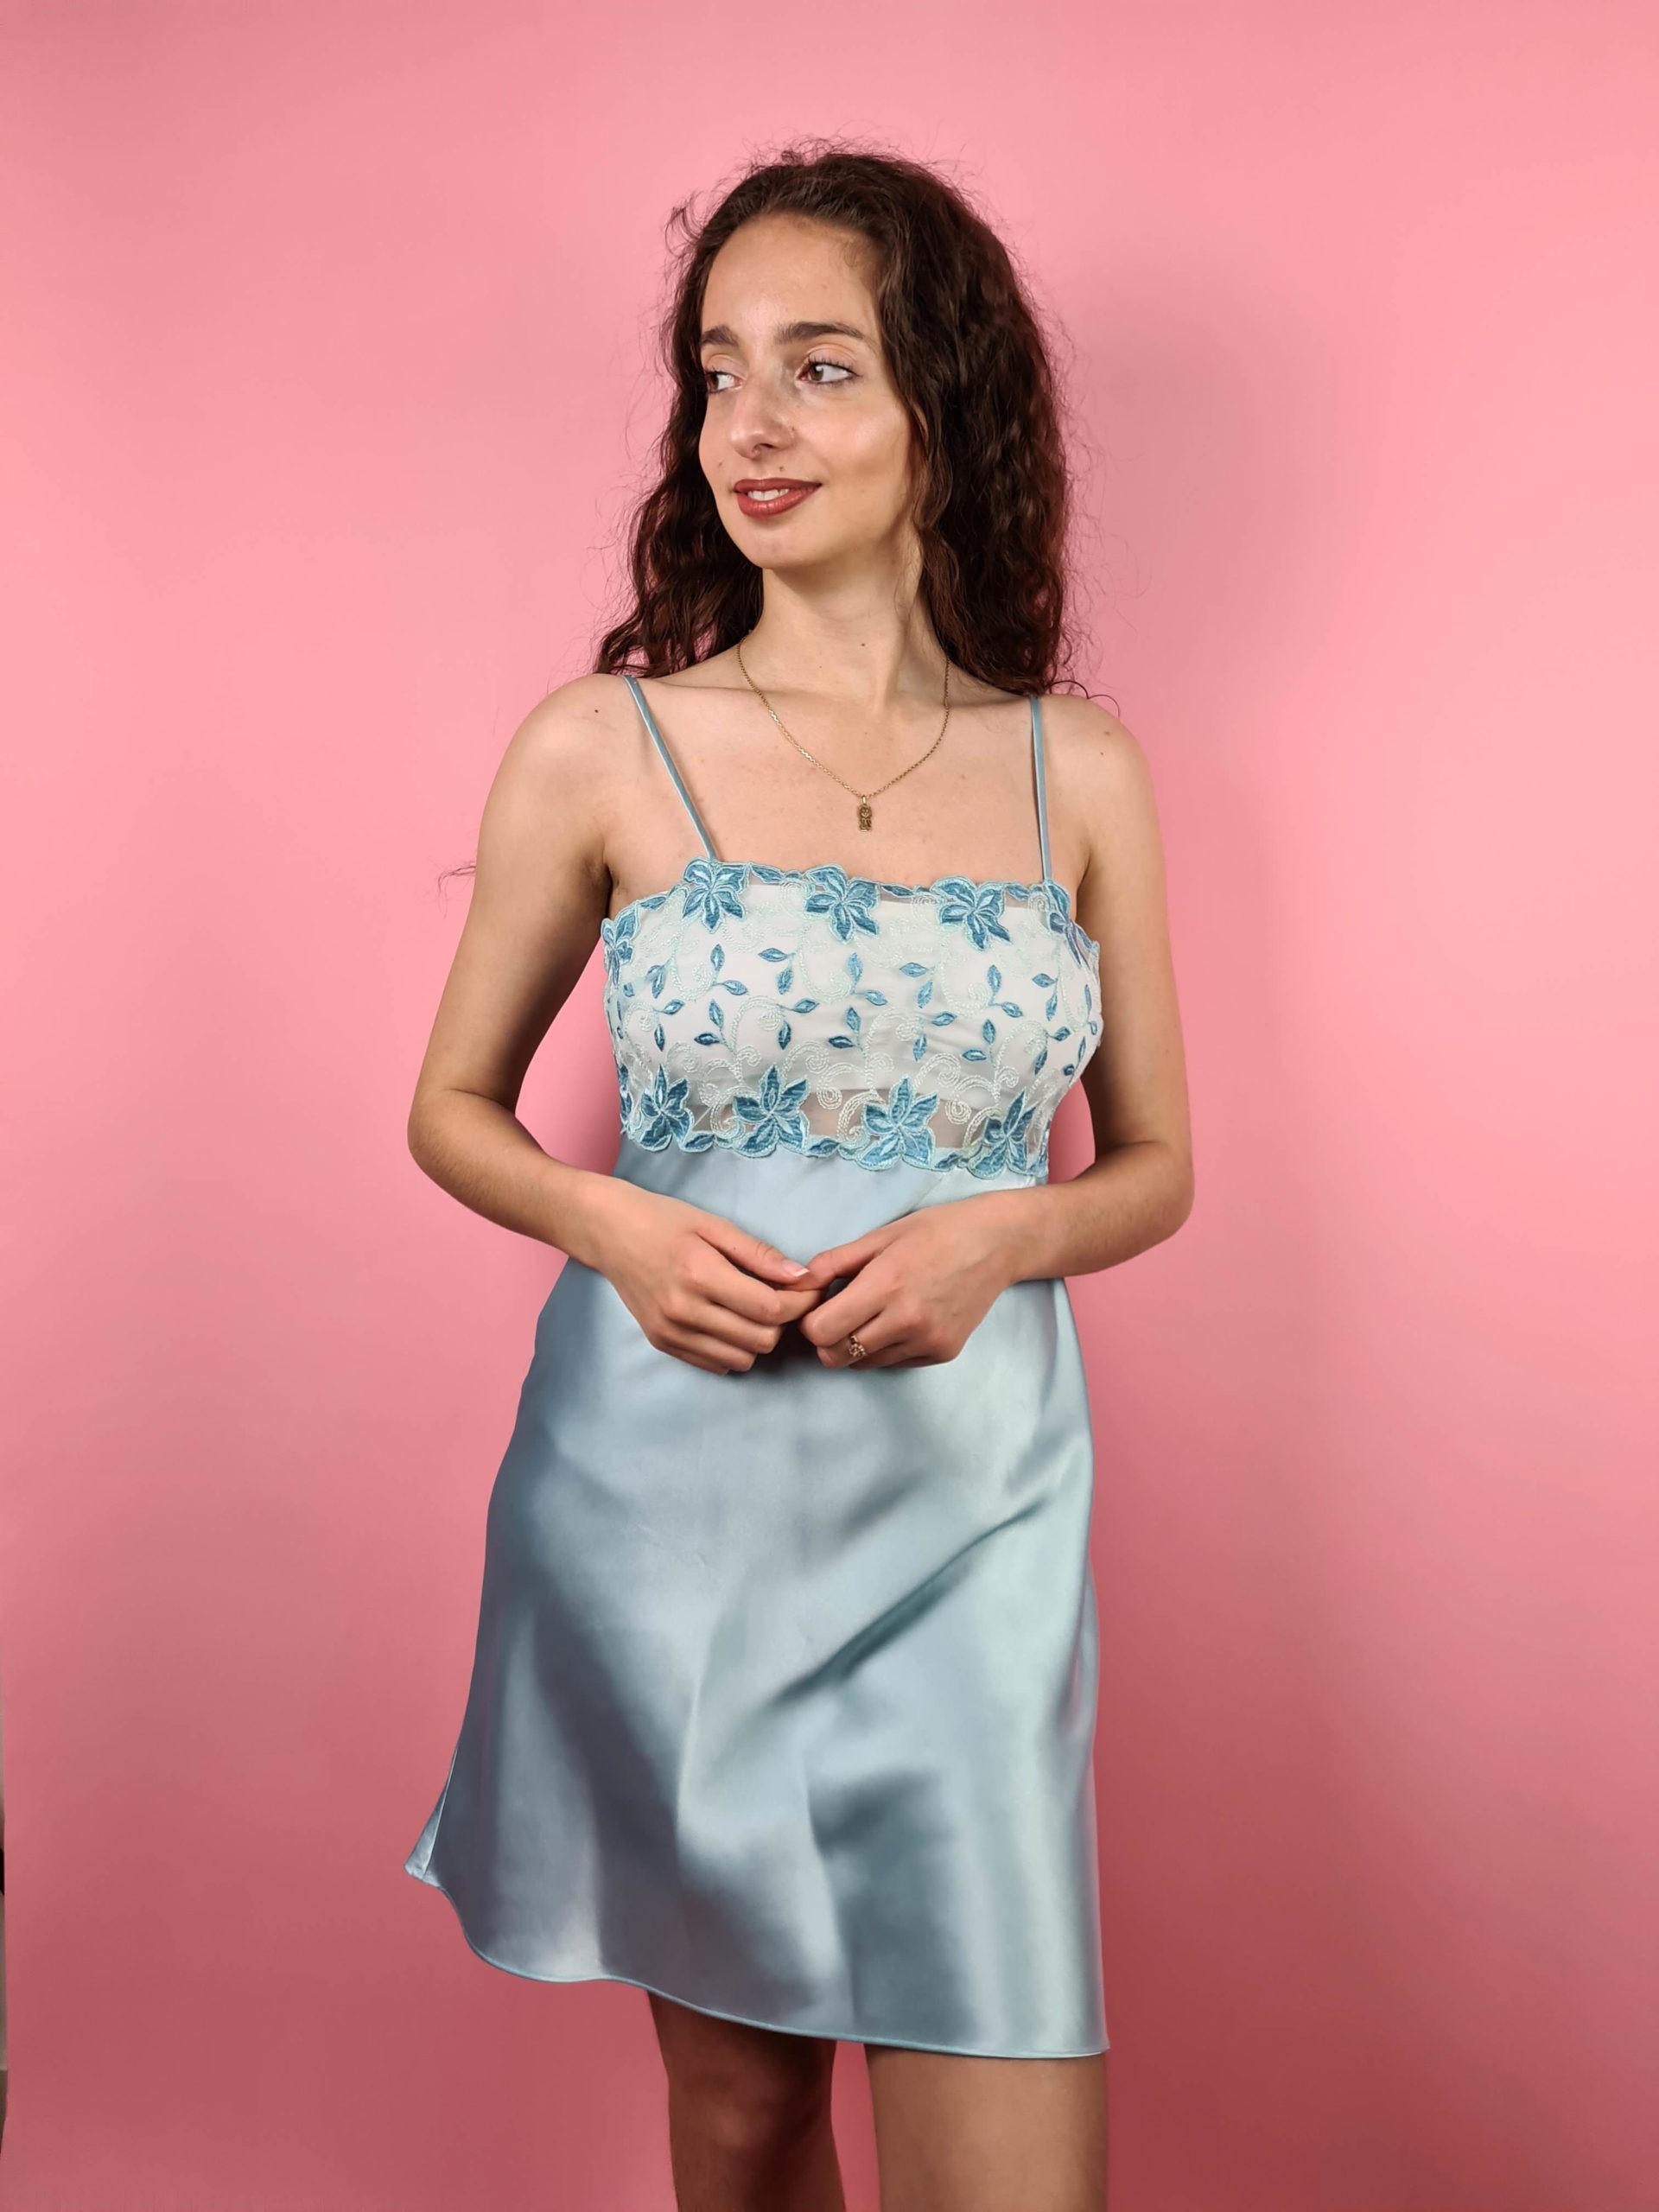 robe nuisette bleue pastel broderie (6)